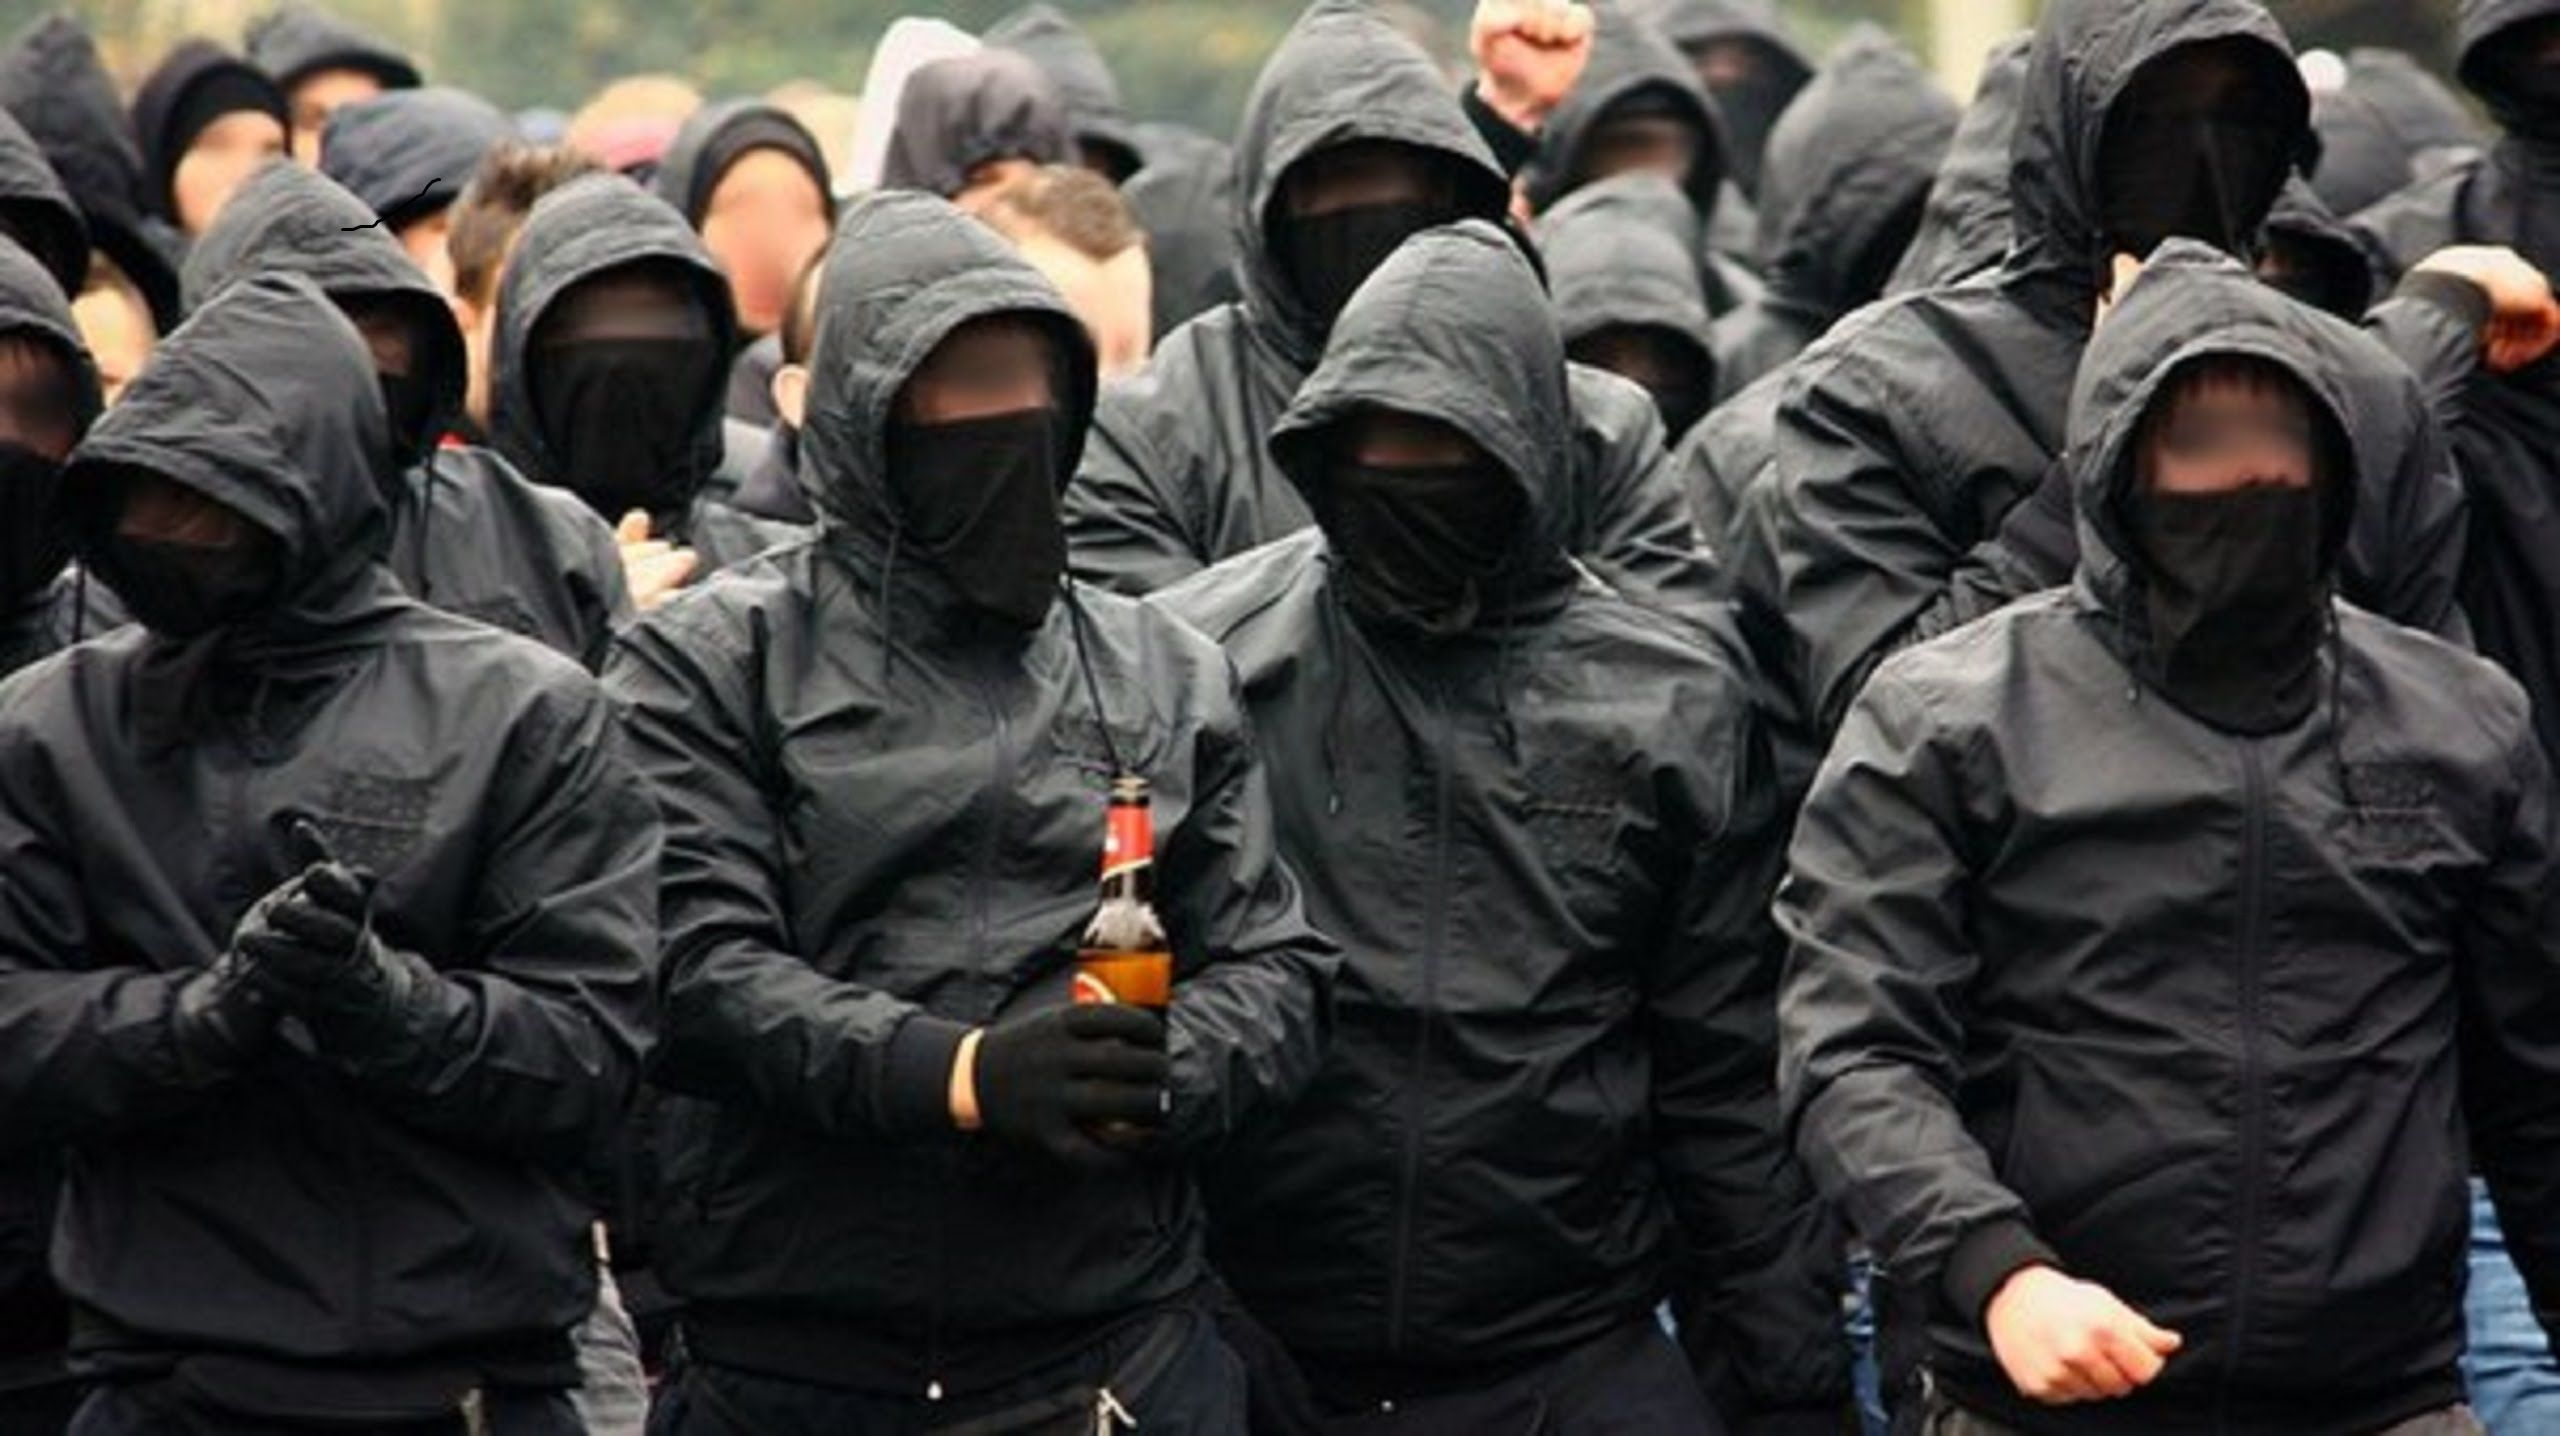 Hooligans Wallpapers Top Free Hooligans Backgrounds Wallpaperaccess